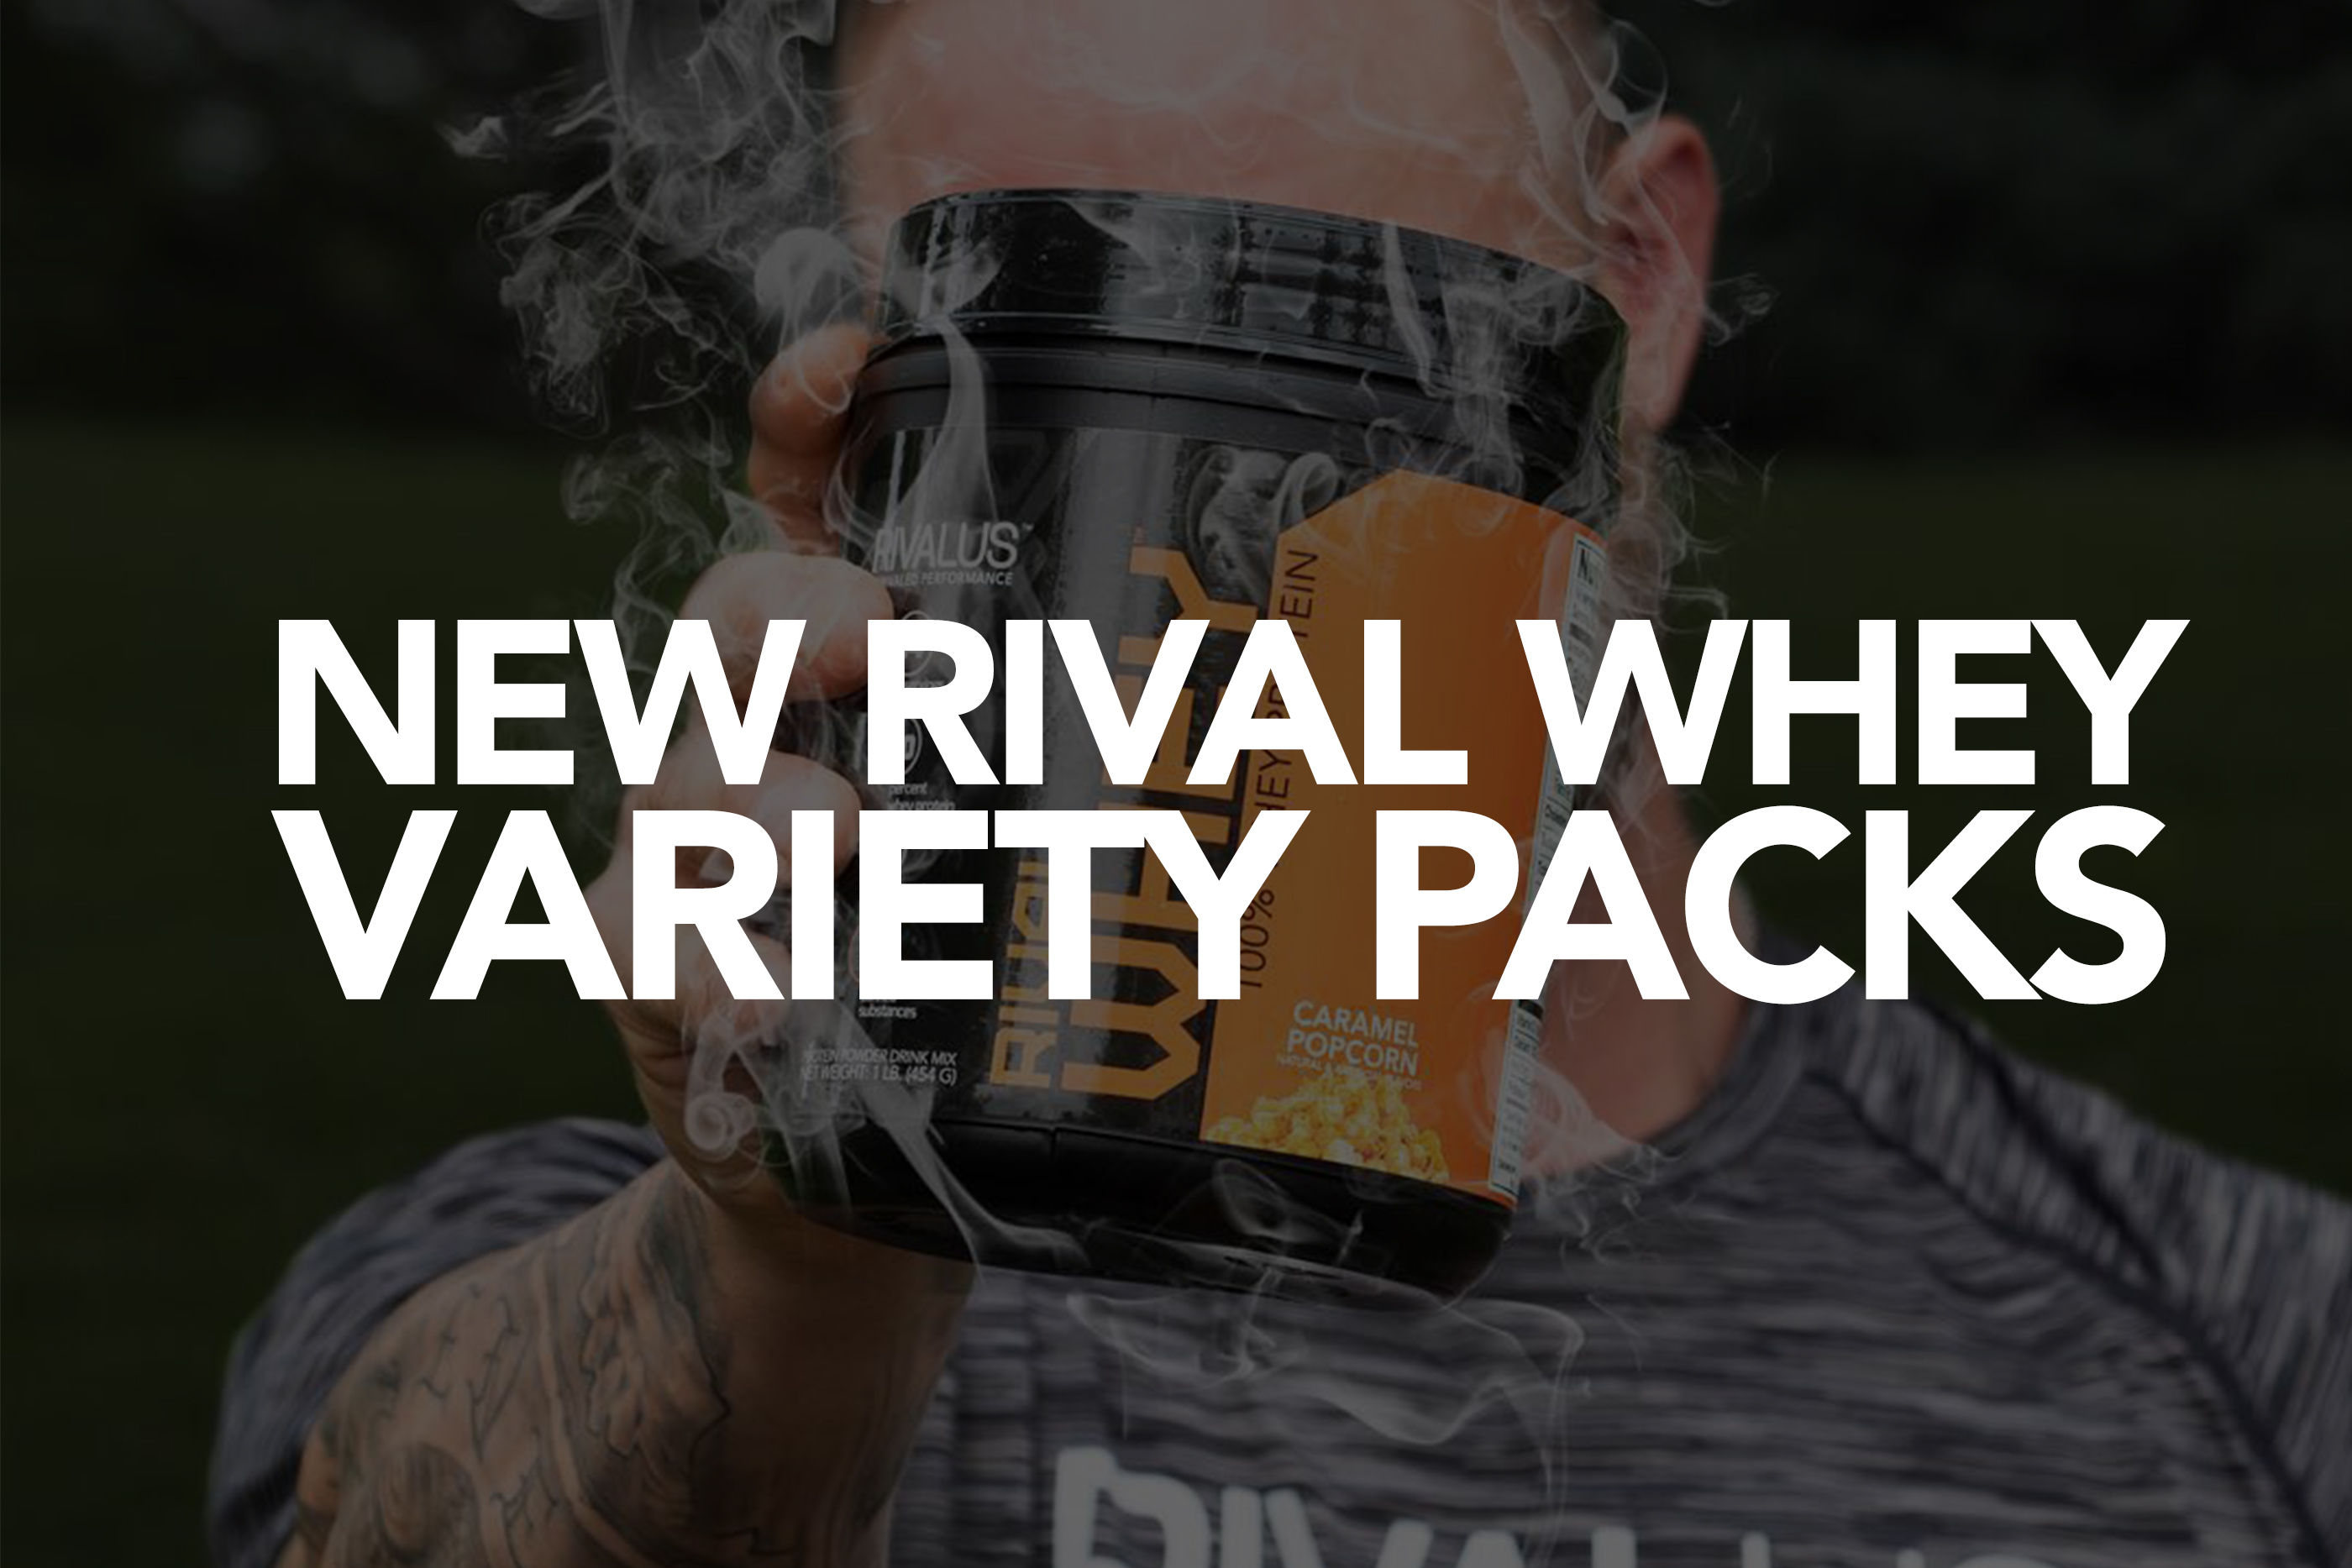 NEW RIVAL WHEY VARIETY PACKS